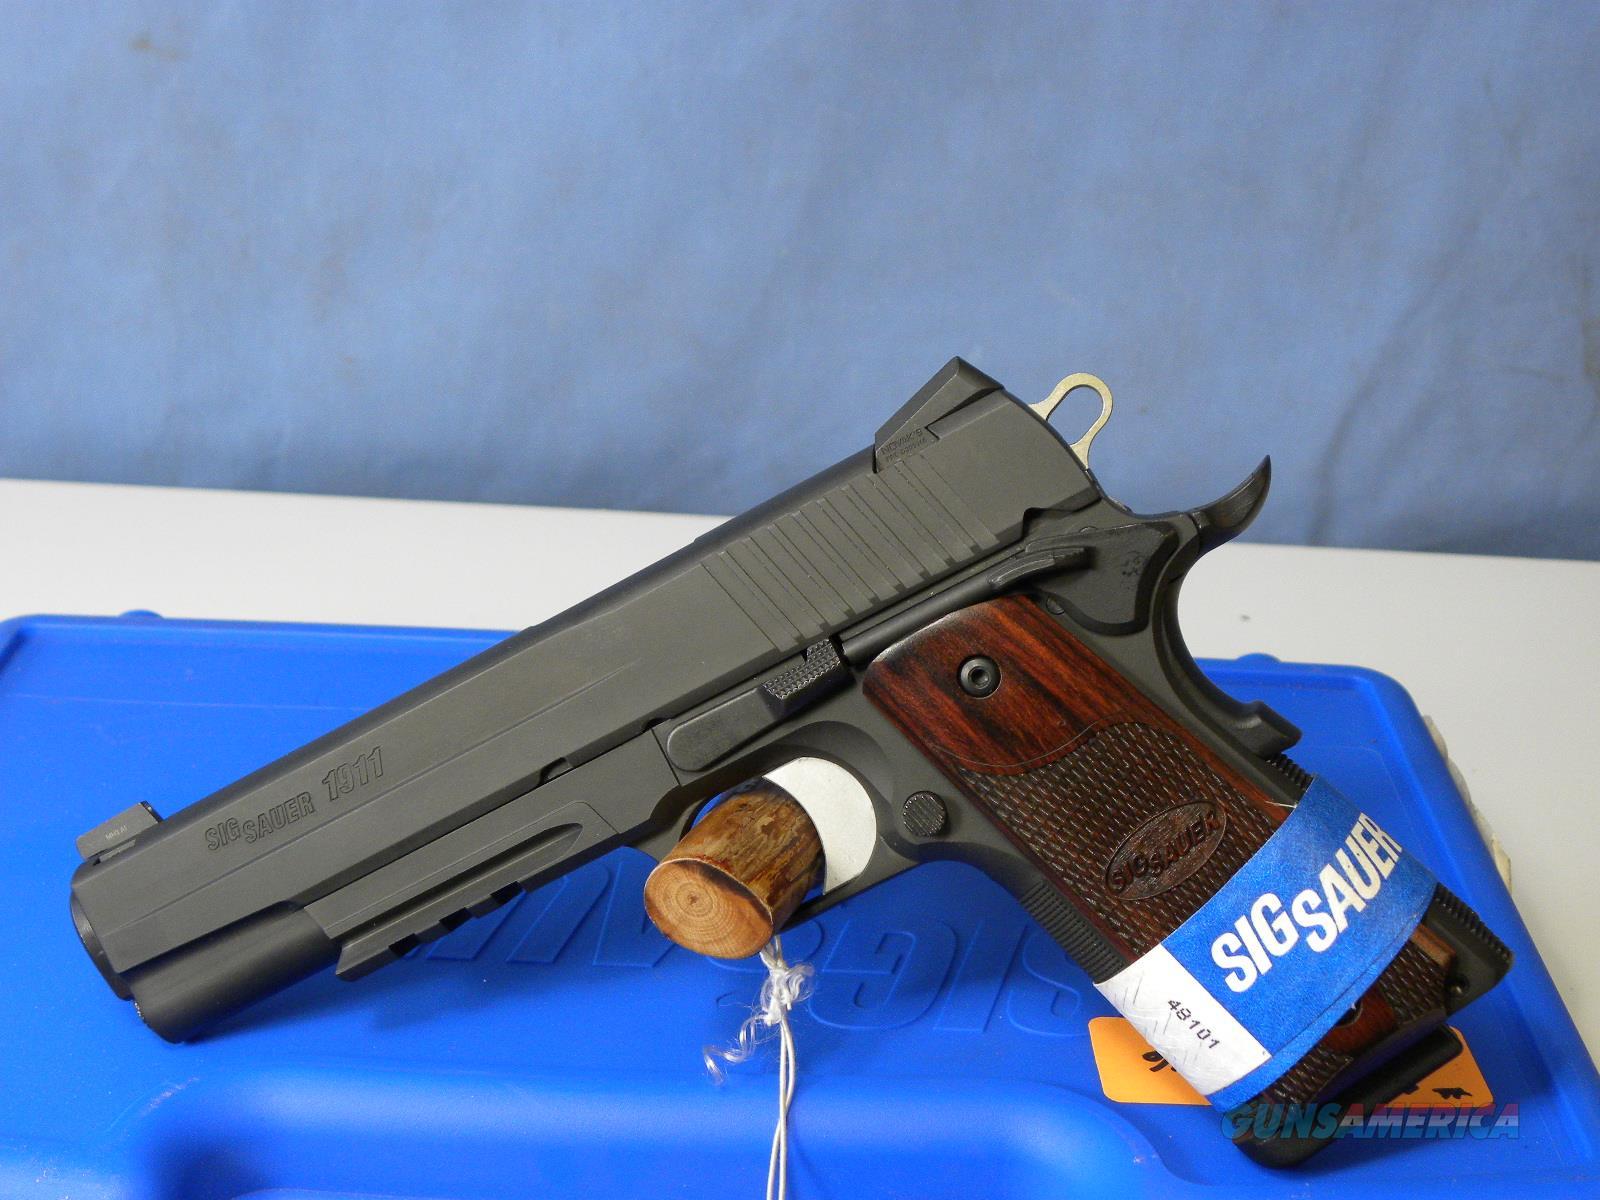 Sig Sauer 1911R-45-BSS  Guns > Pistols > Sig - Sauer/Sigarms Pistols > 1911